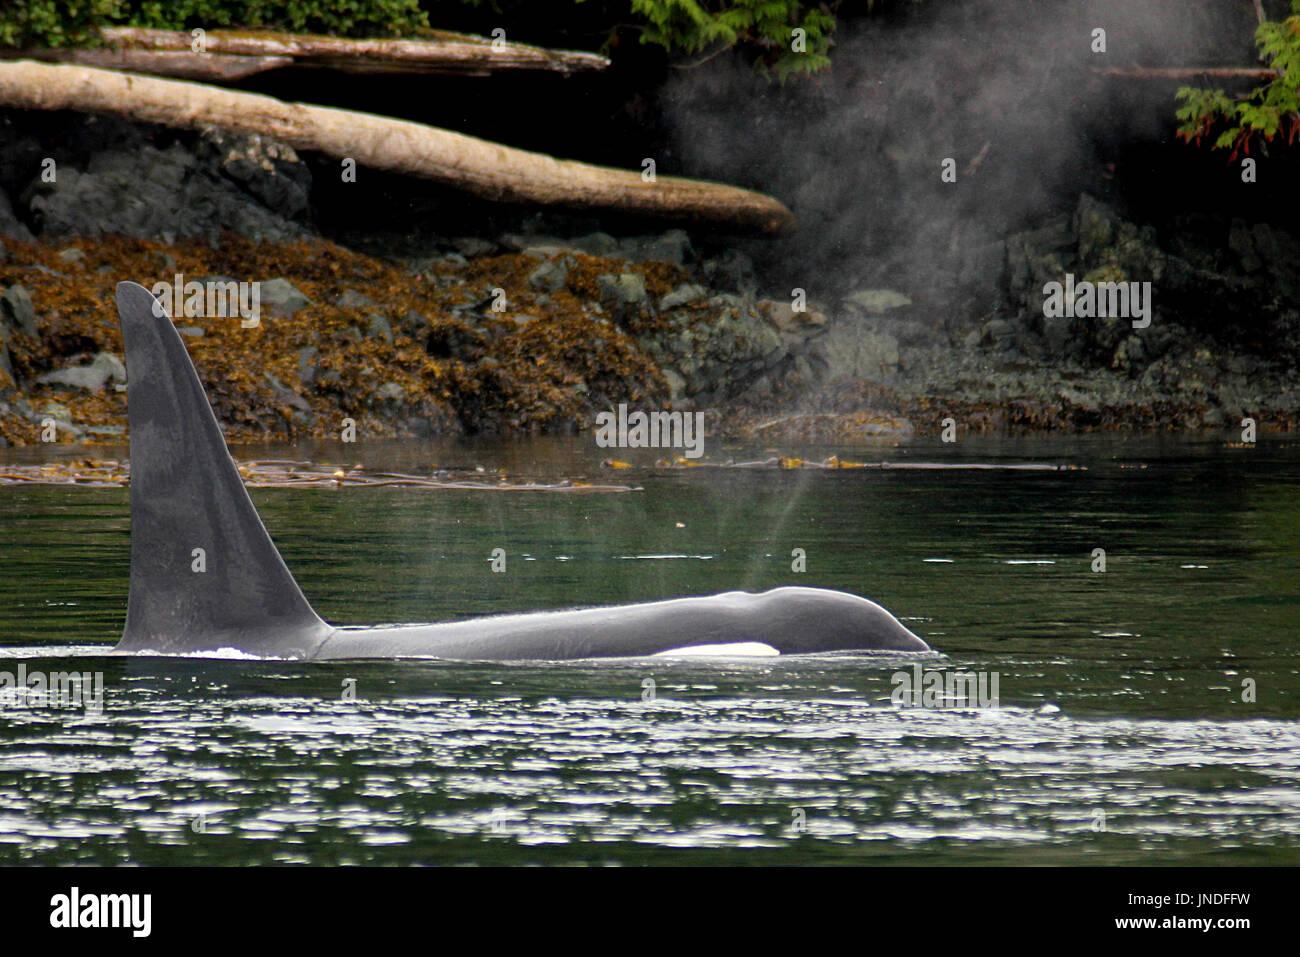 Transient orca killer whale surfacing near Quadra Island in British Columbia - Stock Image